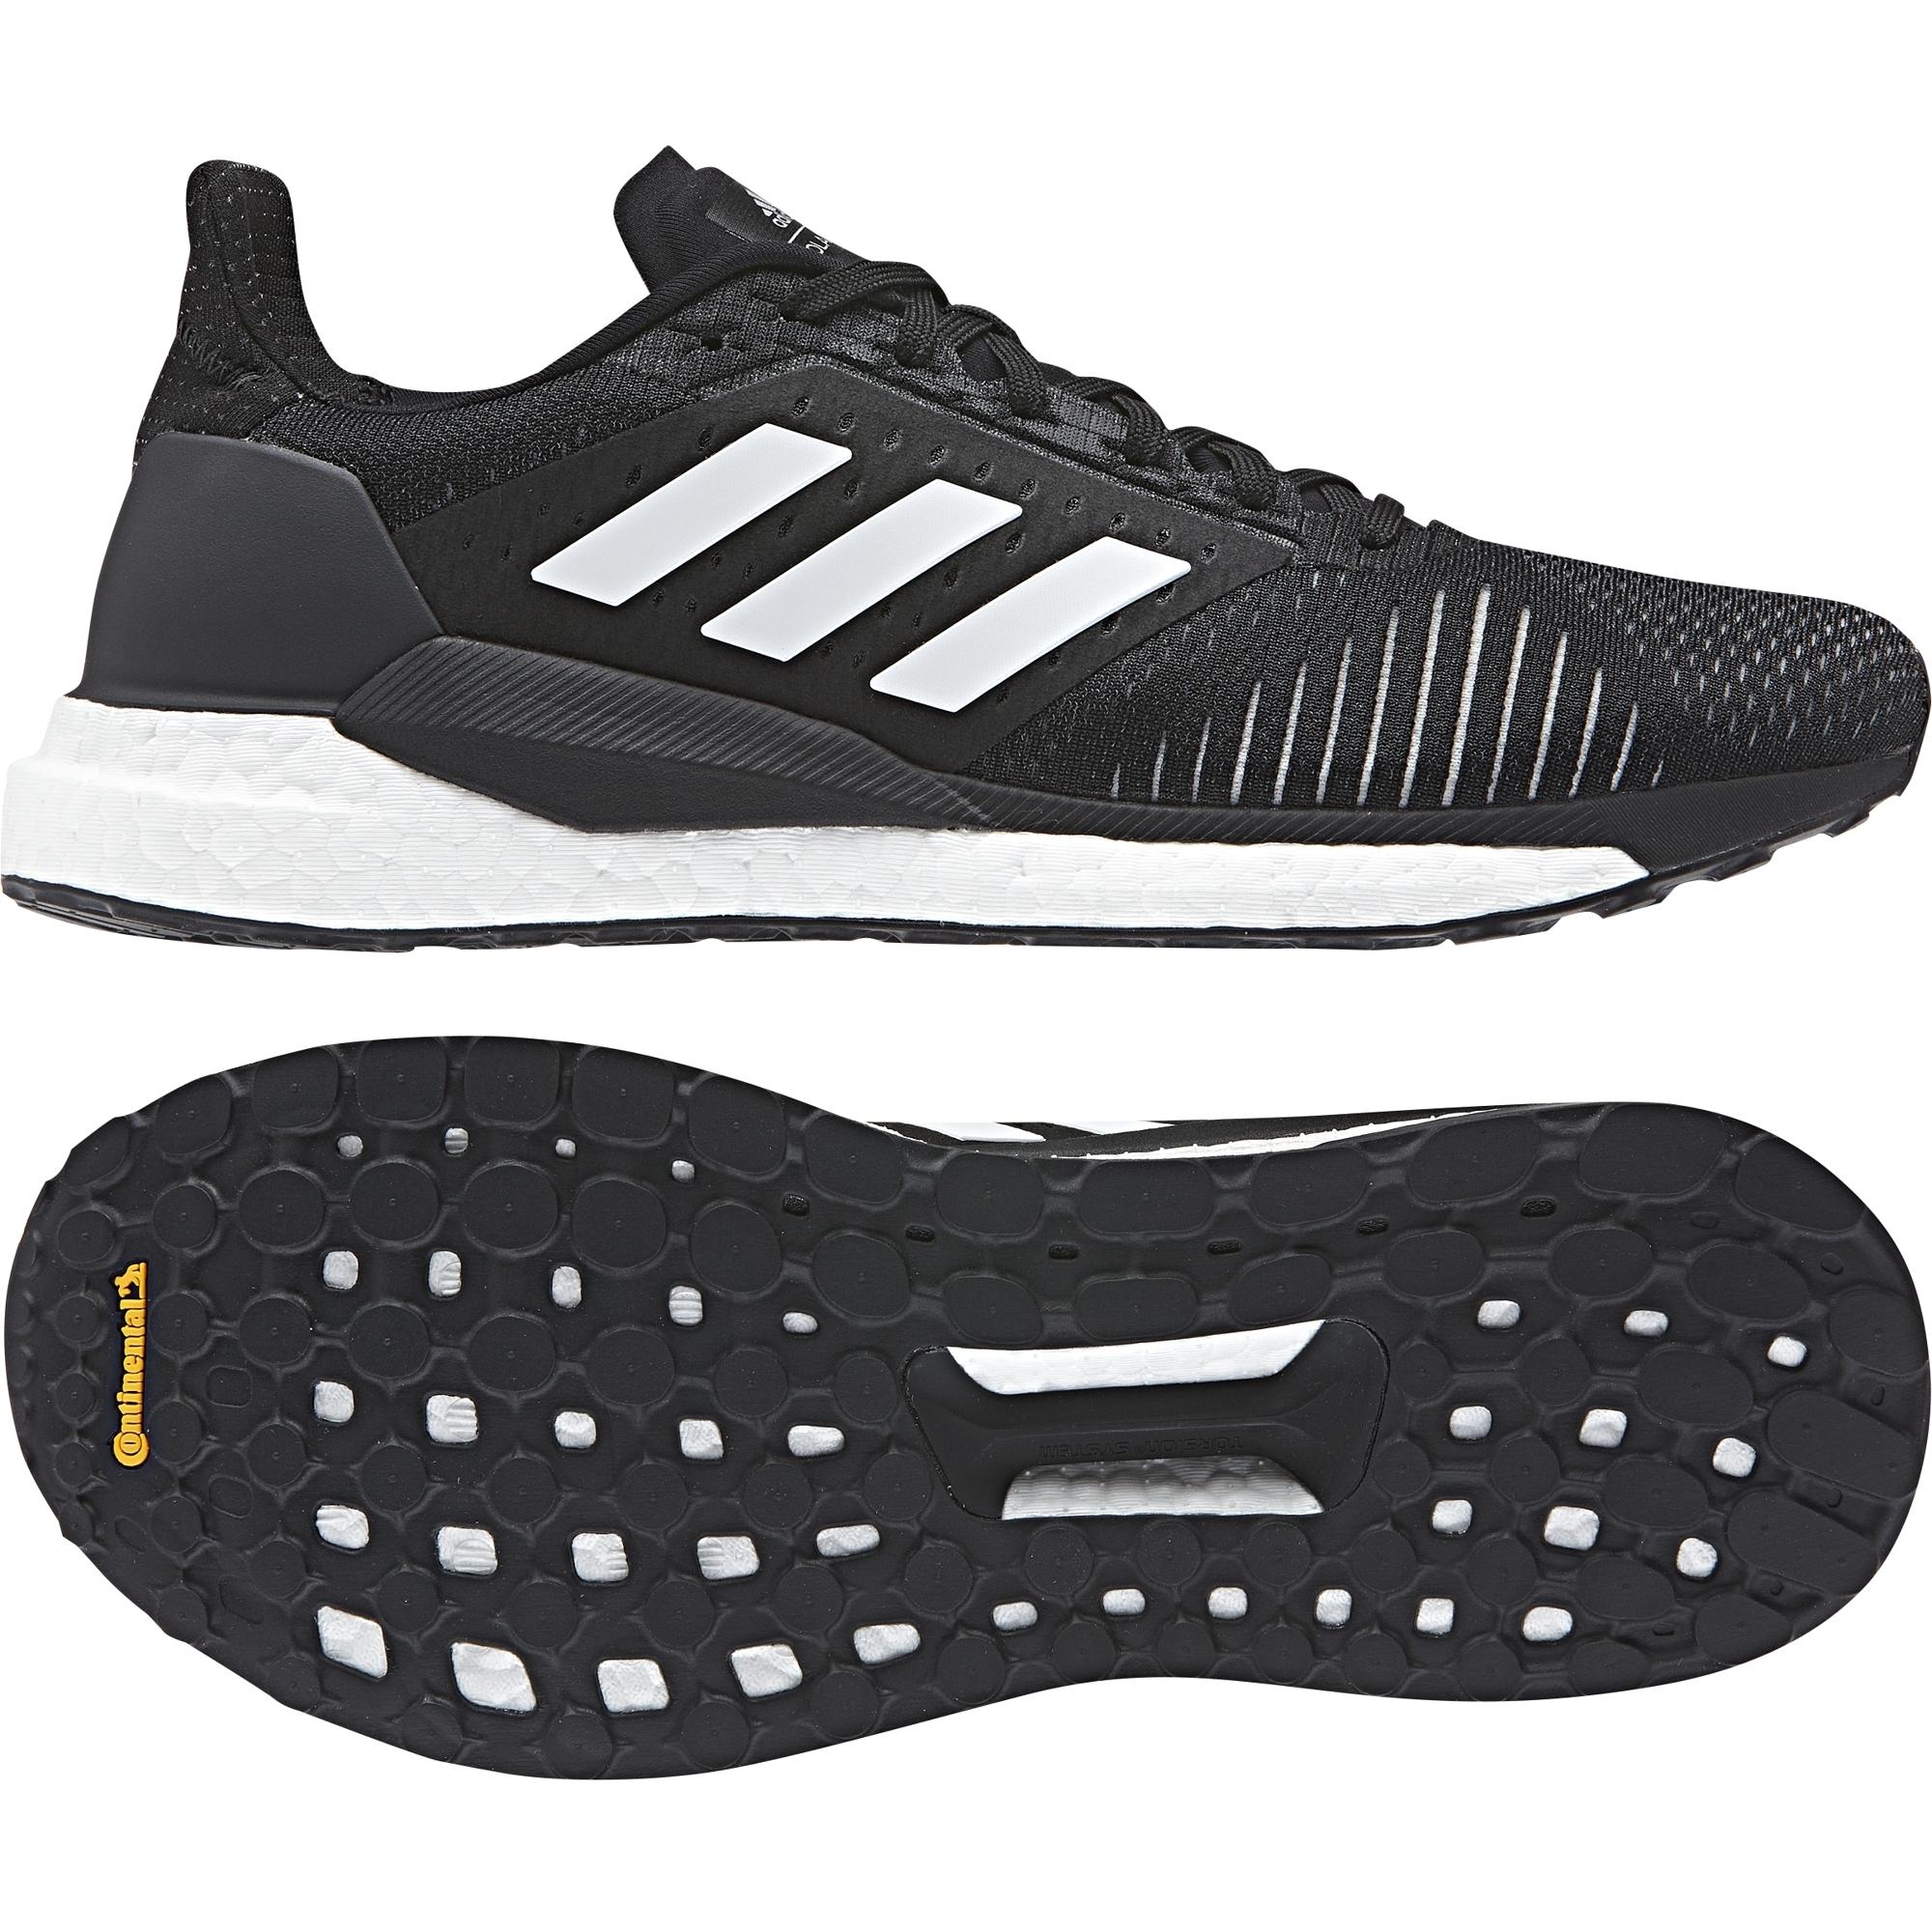 Adidas Boost Herren Laufschuh Solar Glide ST UK=9,5 EU